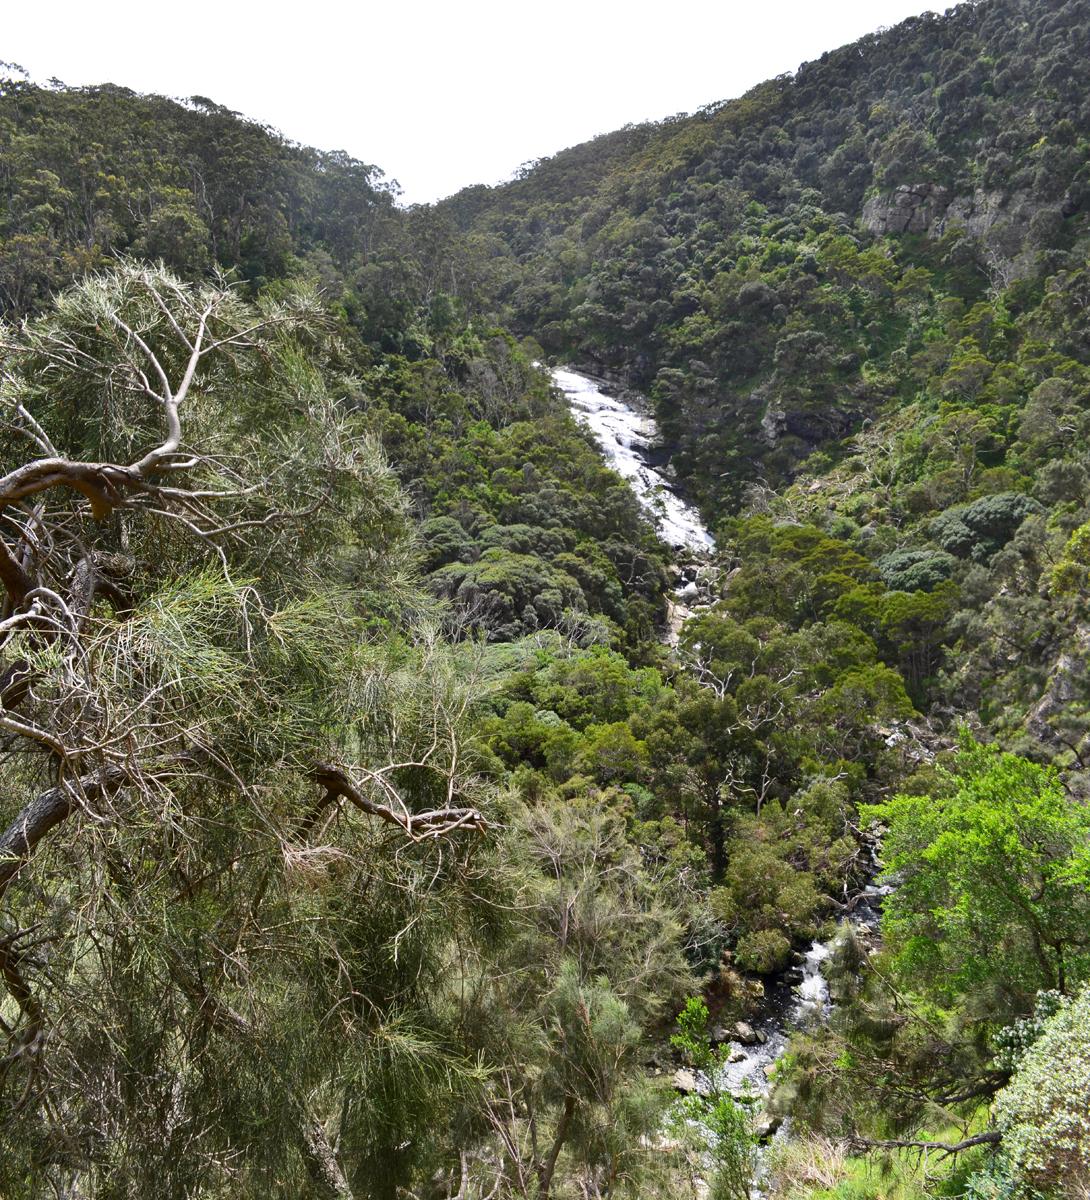 Carisbrook Falls - Great Otway National Park - Great Ocean Road